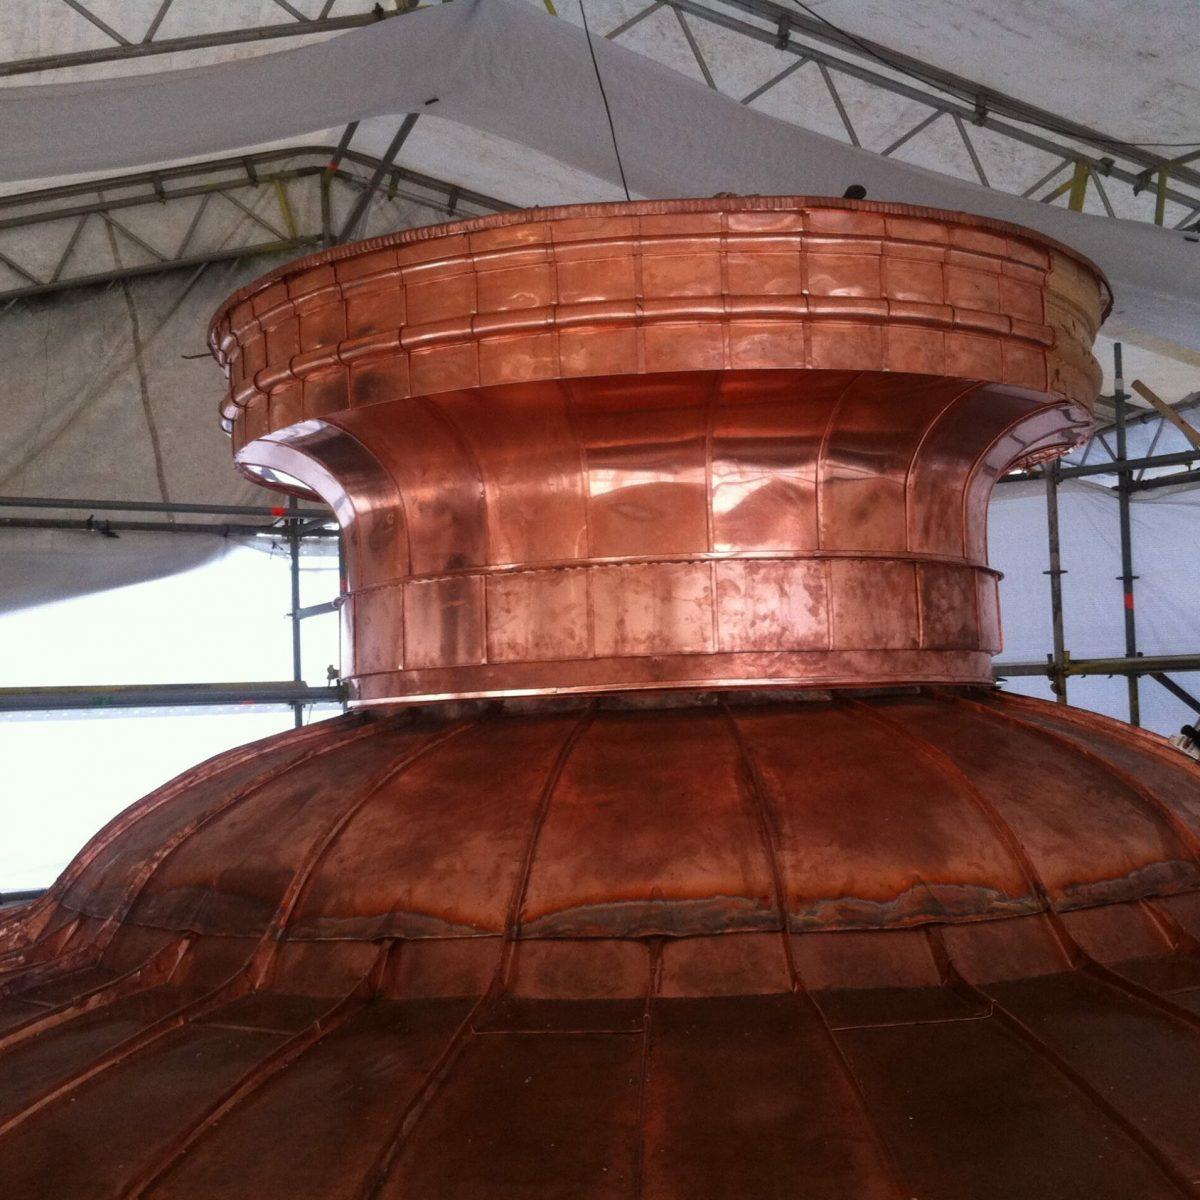 Copper tower - metropolis